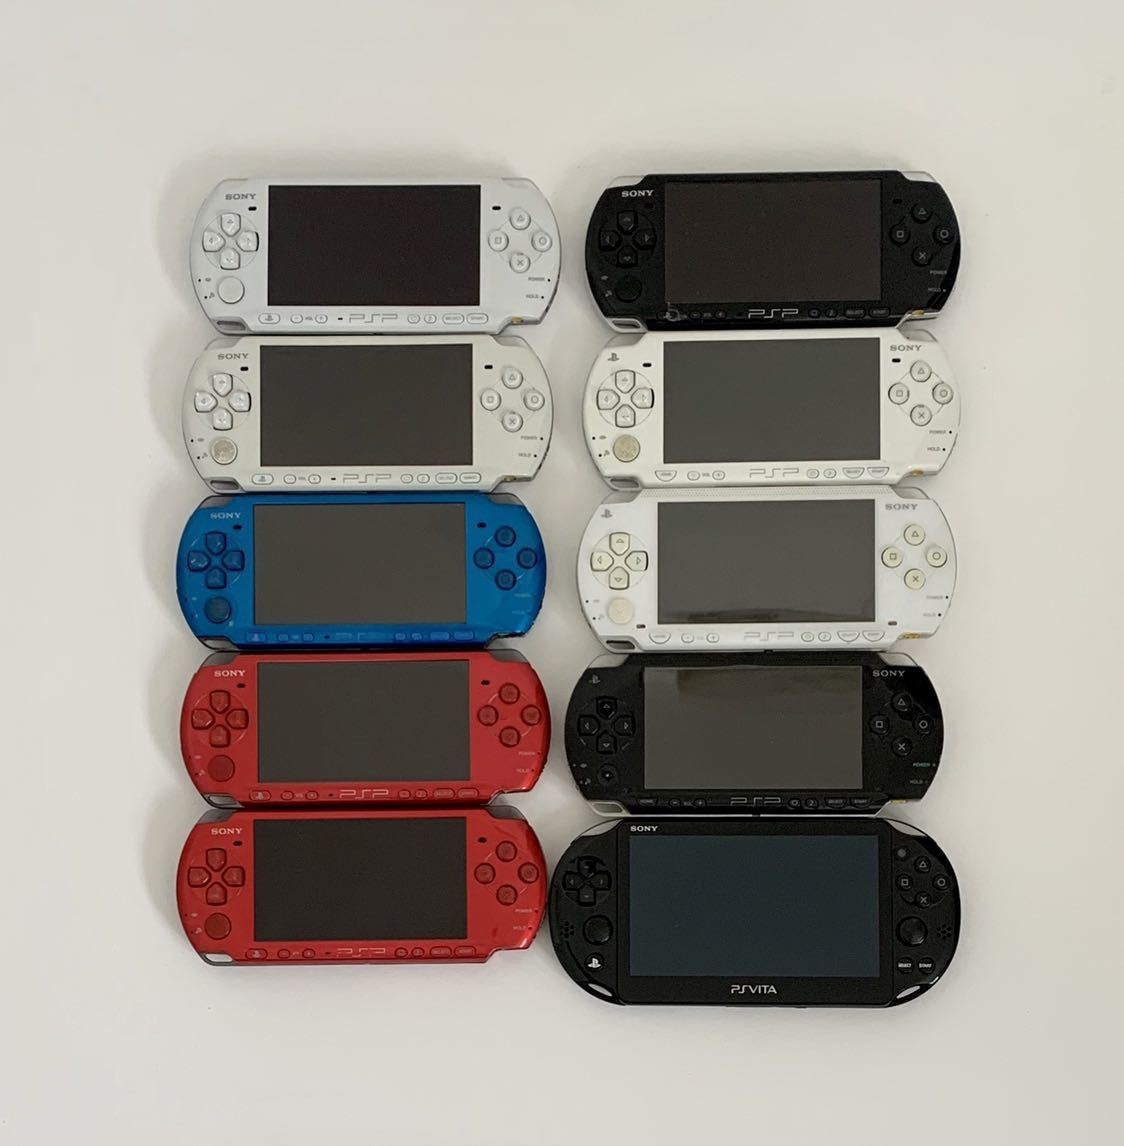 SONY PSP3000/PSP2000/PSP1000/PS VITA PCH-2000 ジャンク 10台セット まとめて